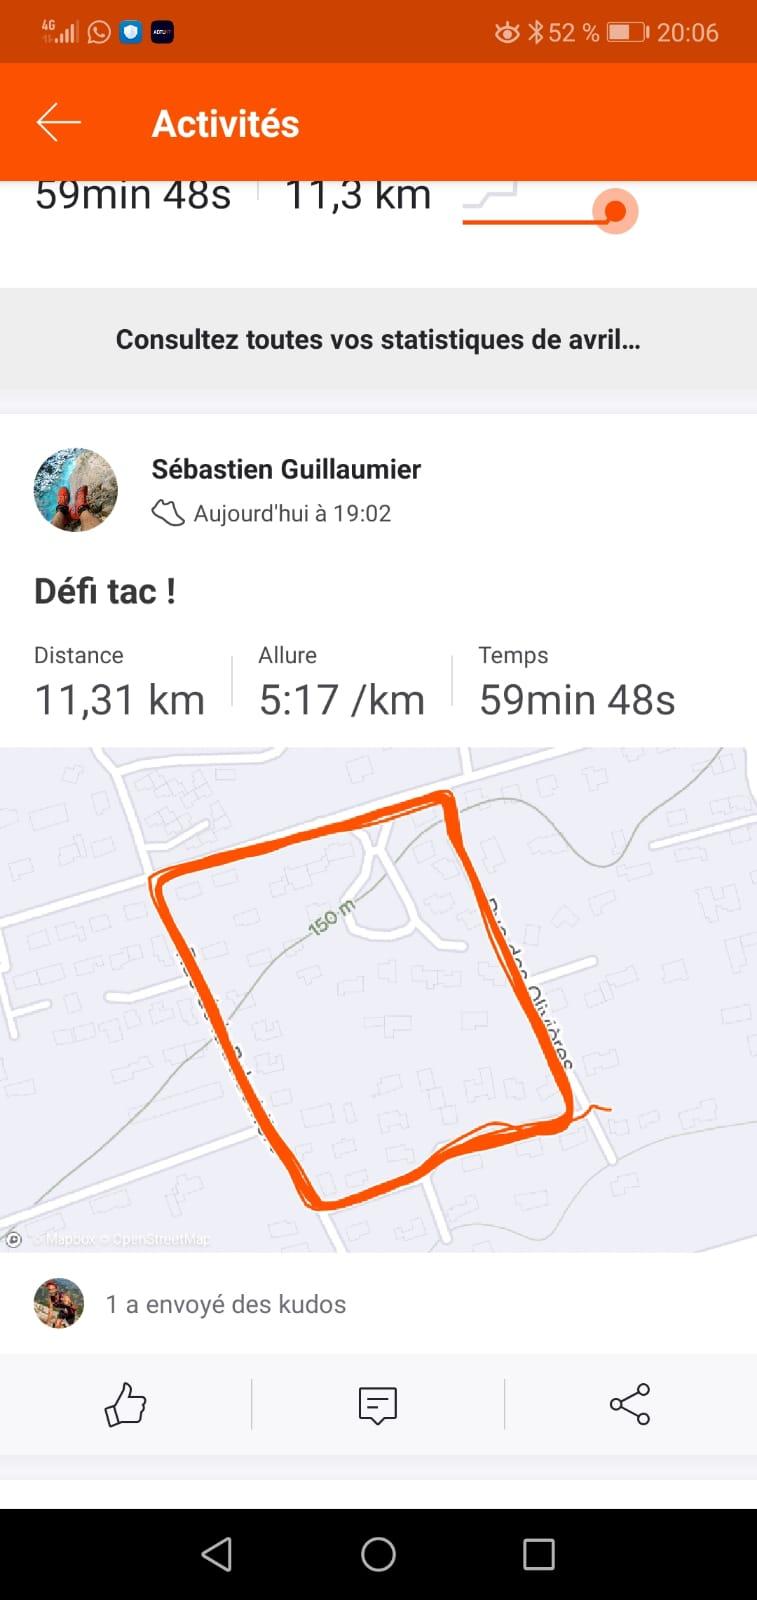 47-Joli trace d'1h de running pour Seb' G